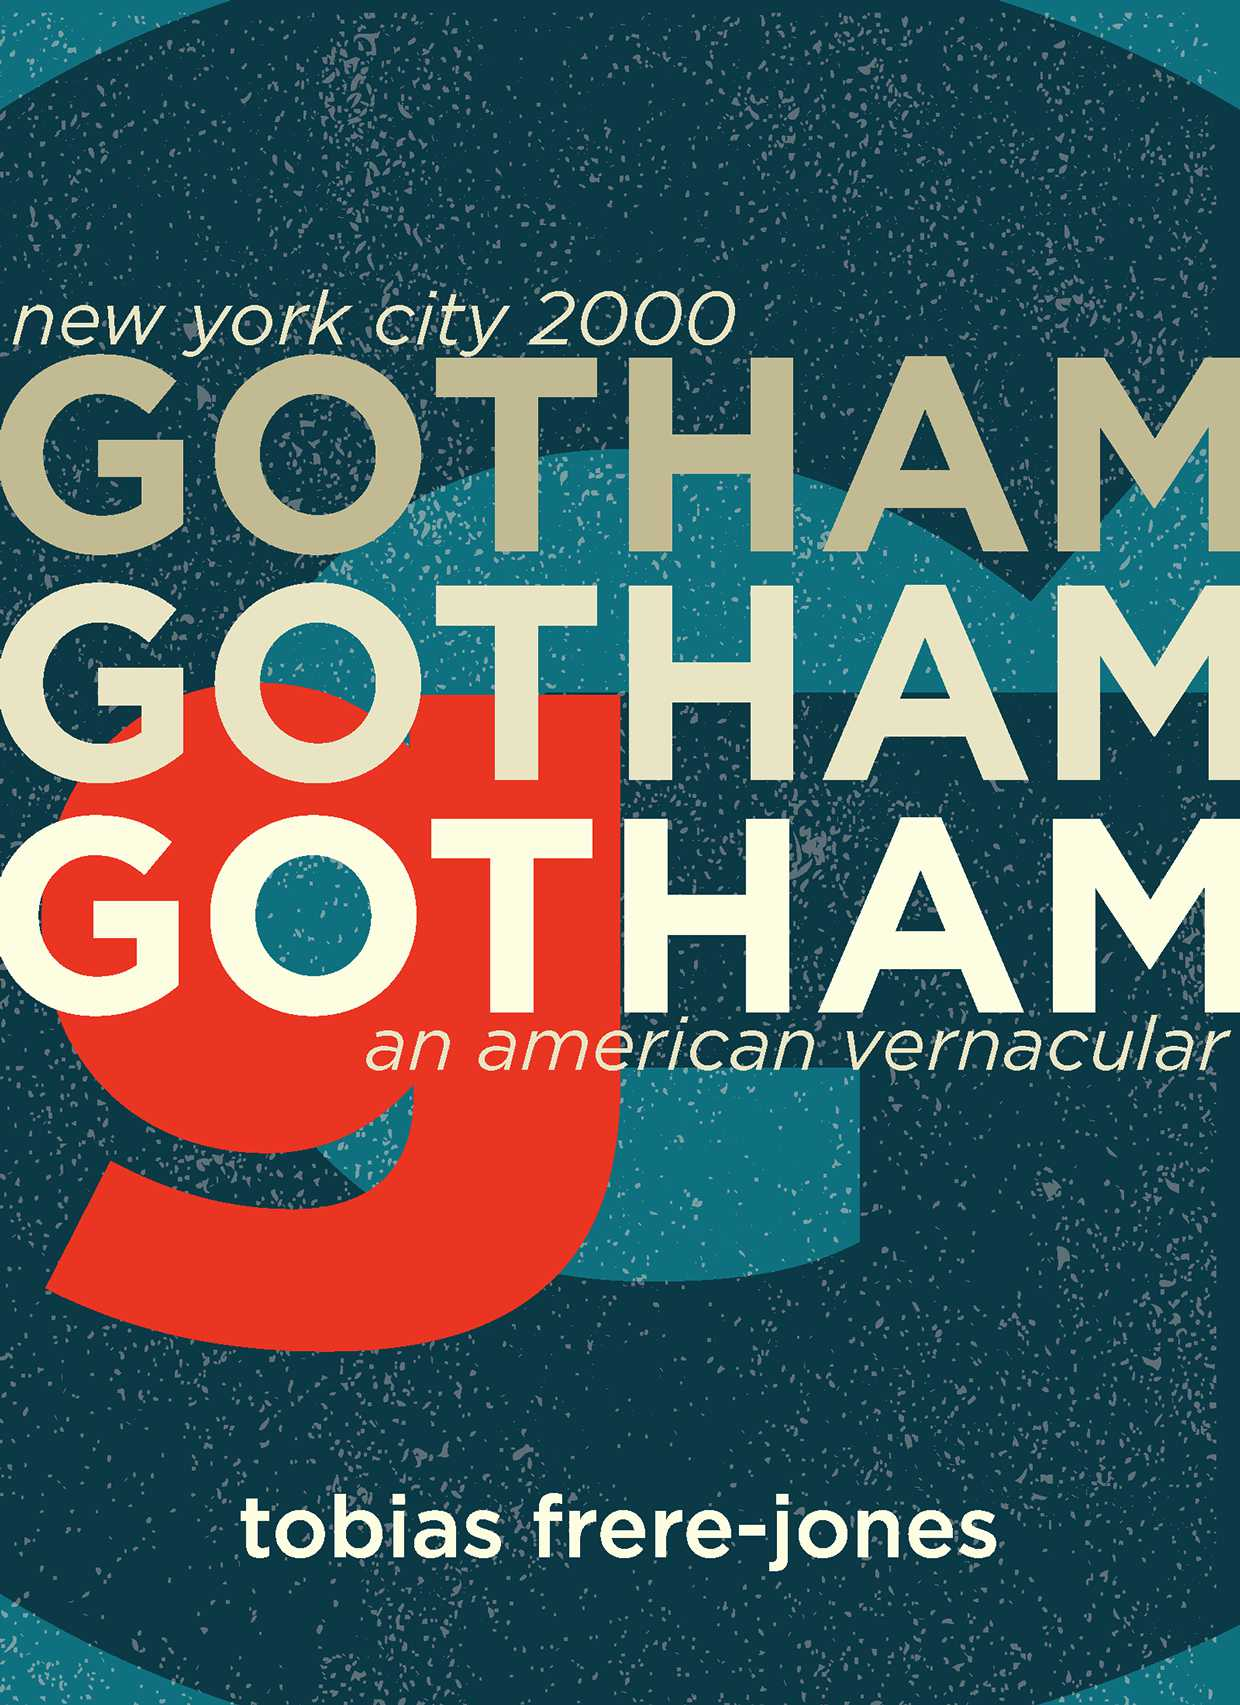 TobiasFrereJones+JesseMRagan-Gotham-2003-Poster-by-KatieRodden-2014